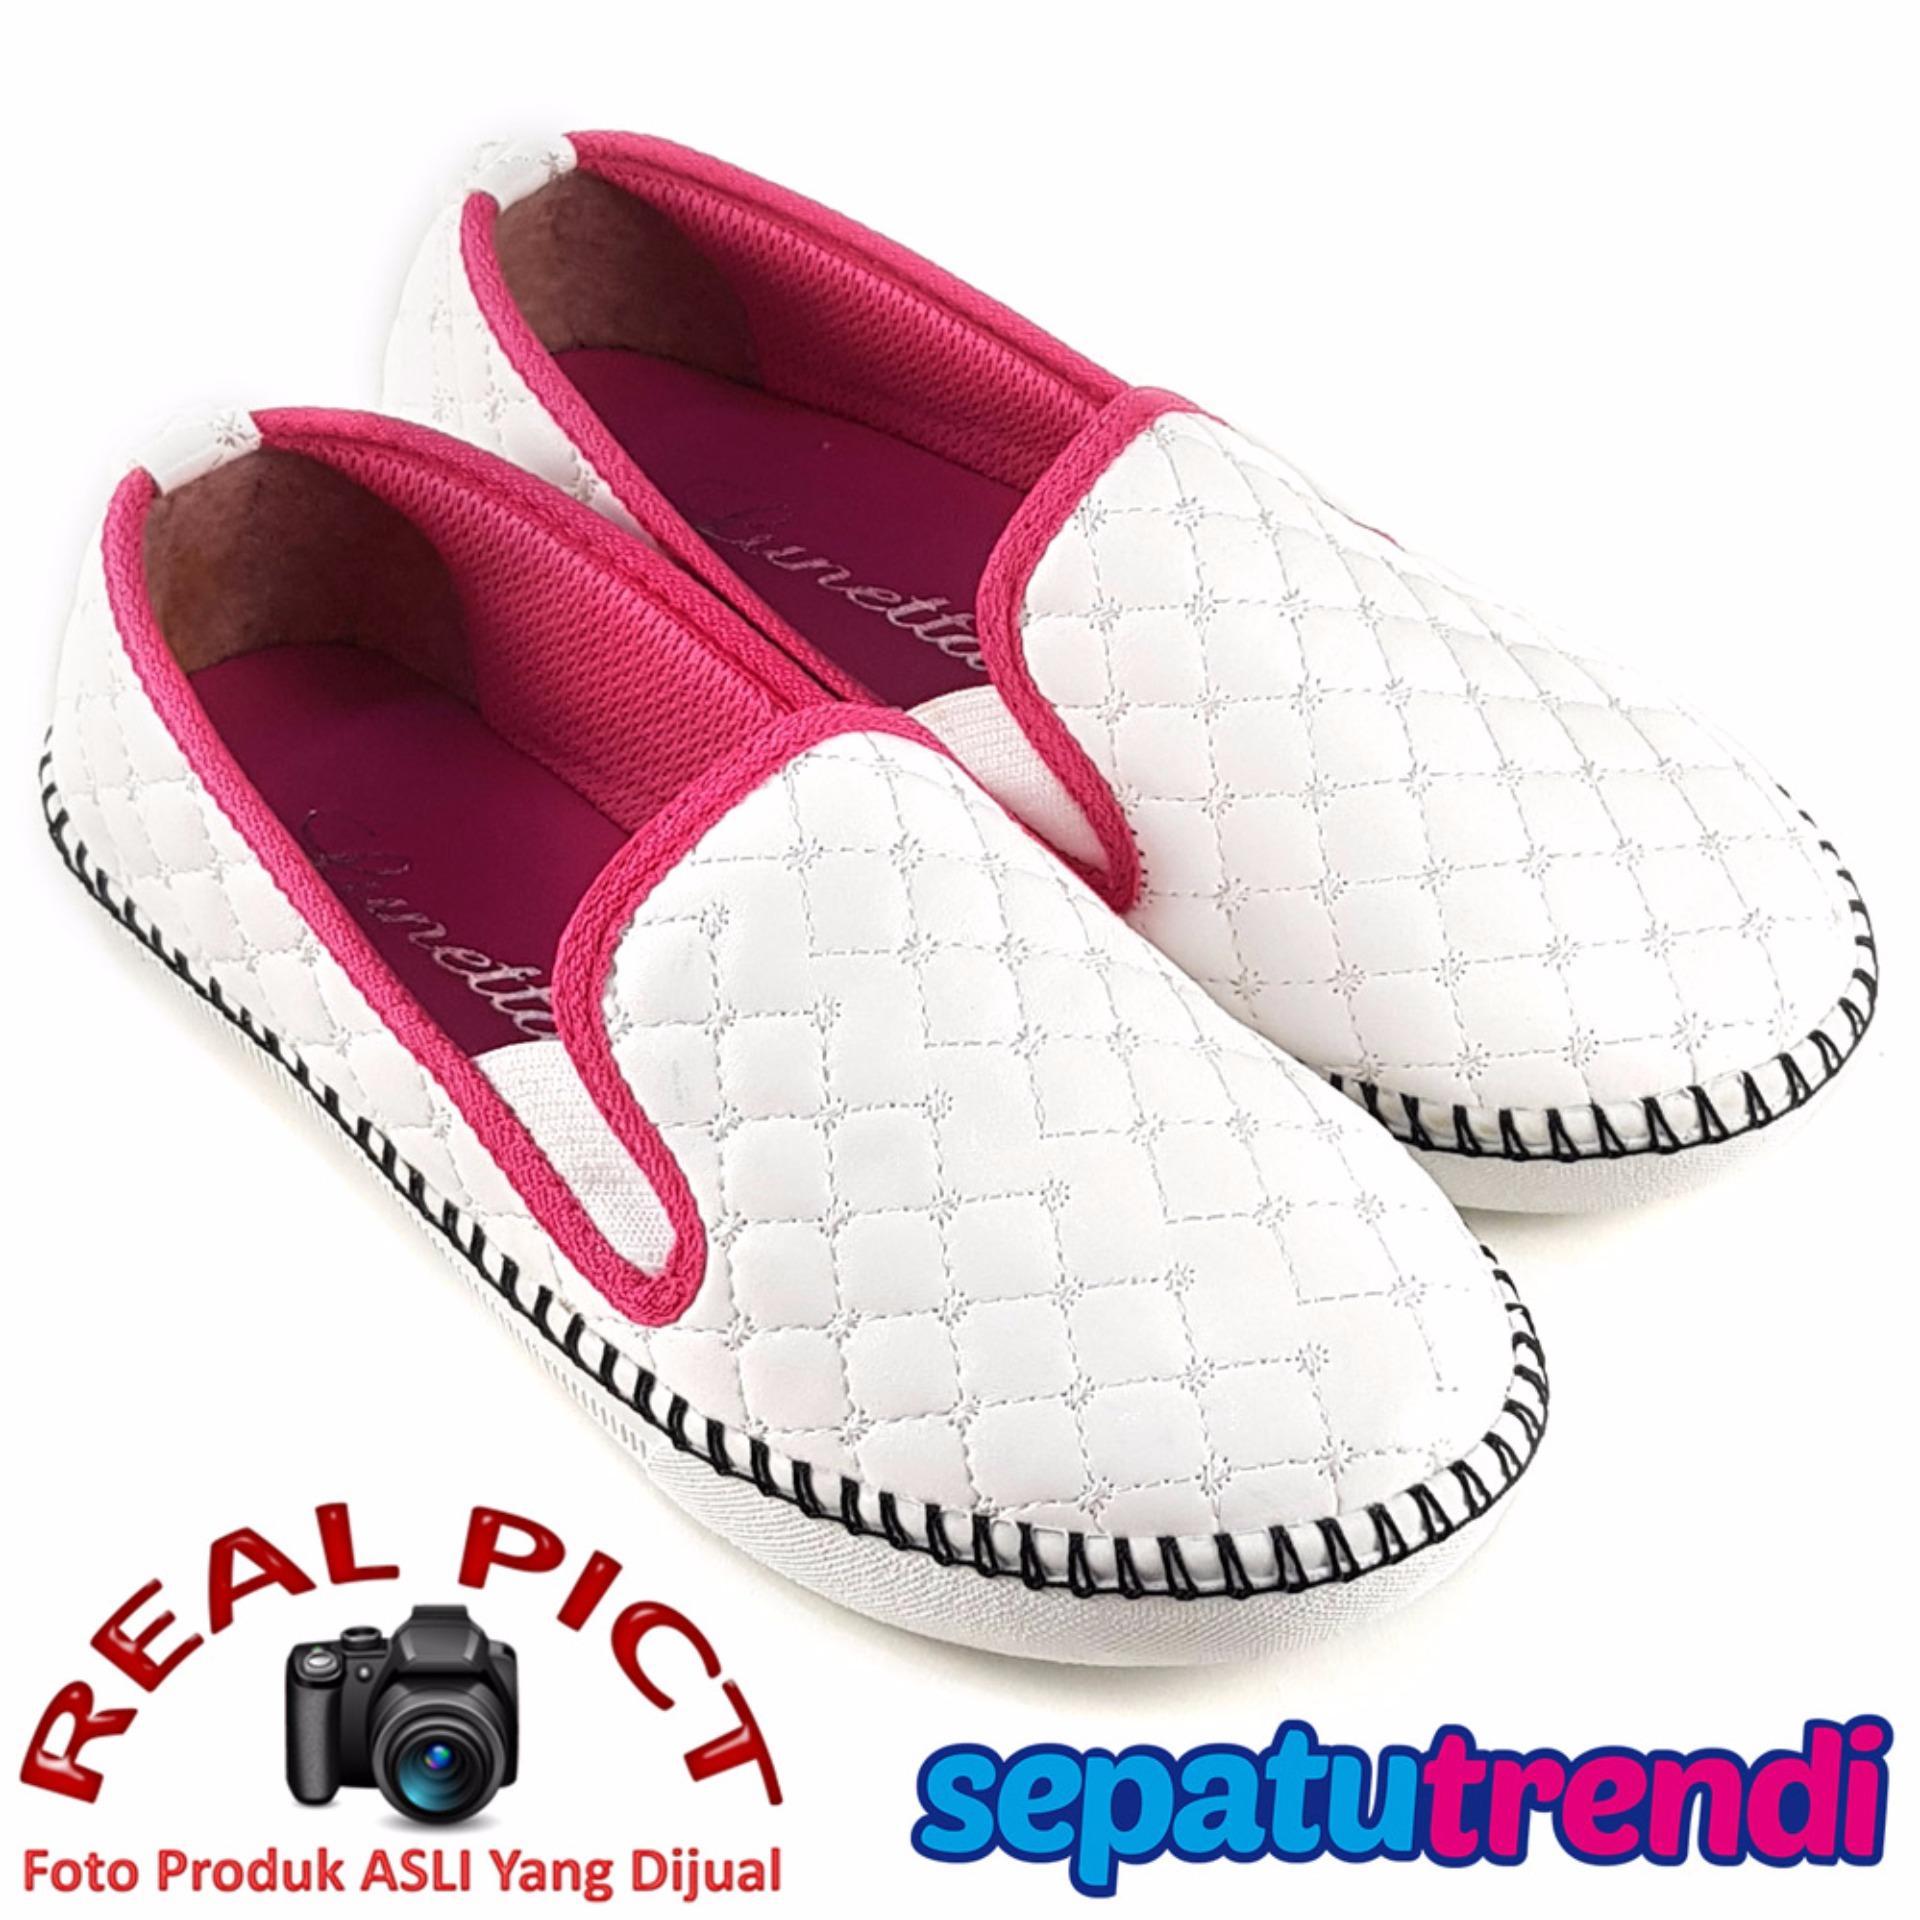 Beli Lunetta Sepatu Anak Perempuan Slip On Sol Rajut Rjag Putih Lunetta